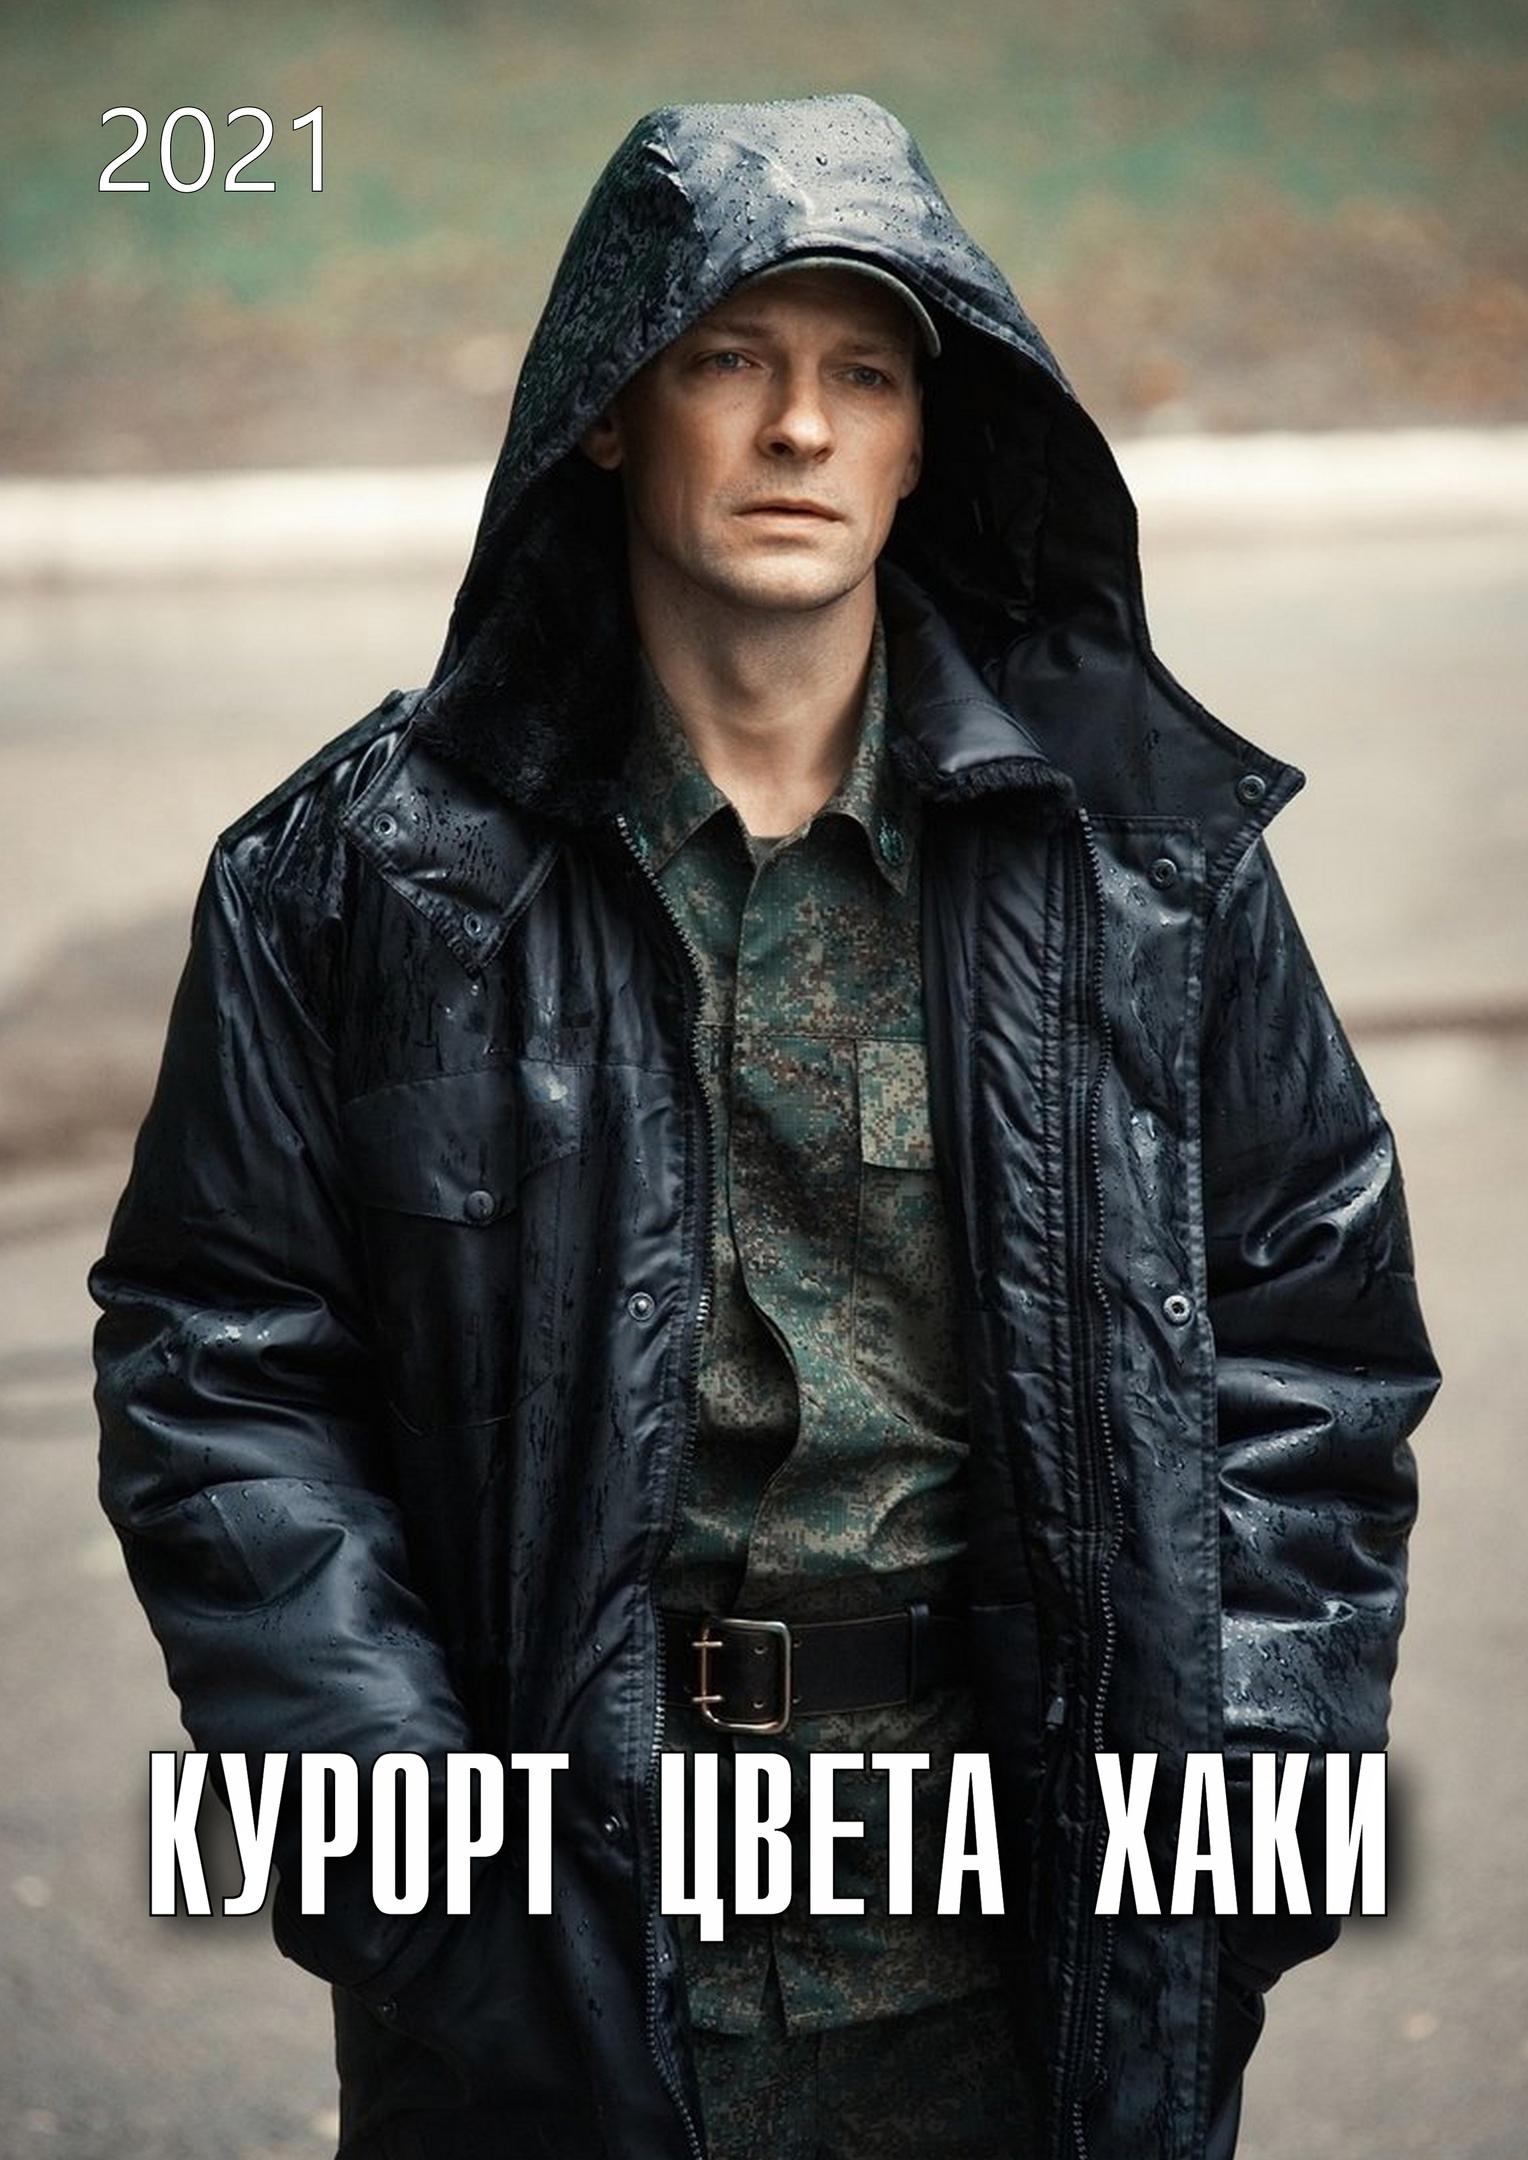 Детектив «Kypopт цвeтa xaки» (2021) 1-3 серия из 8